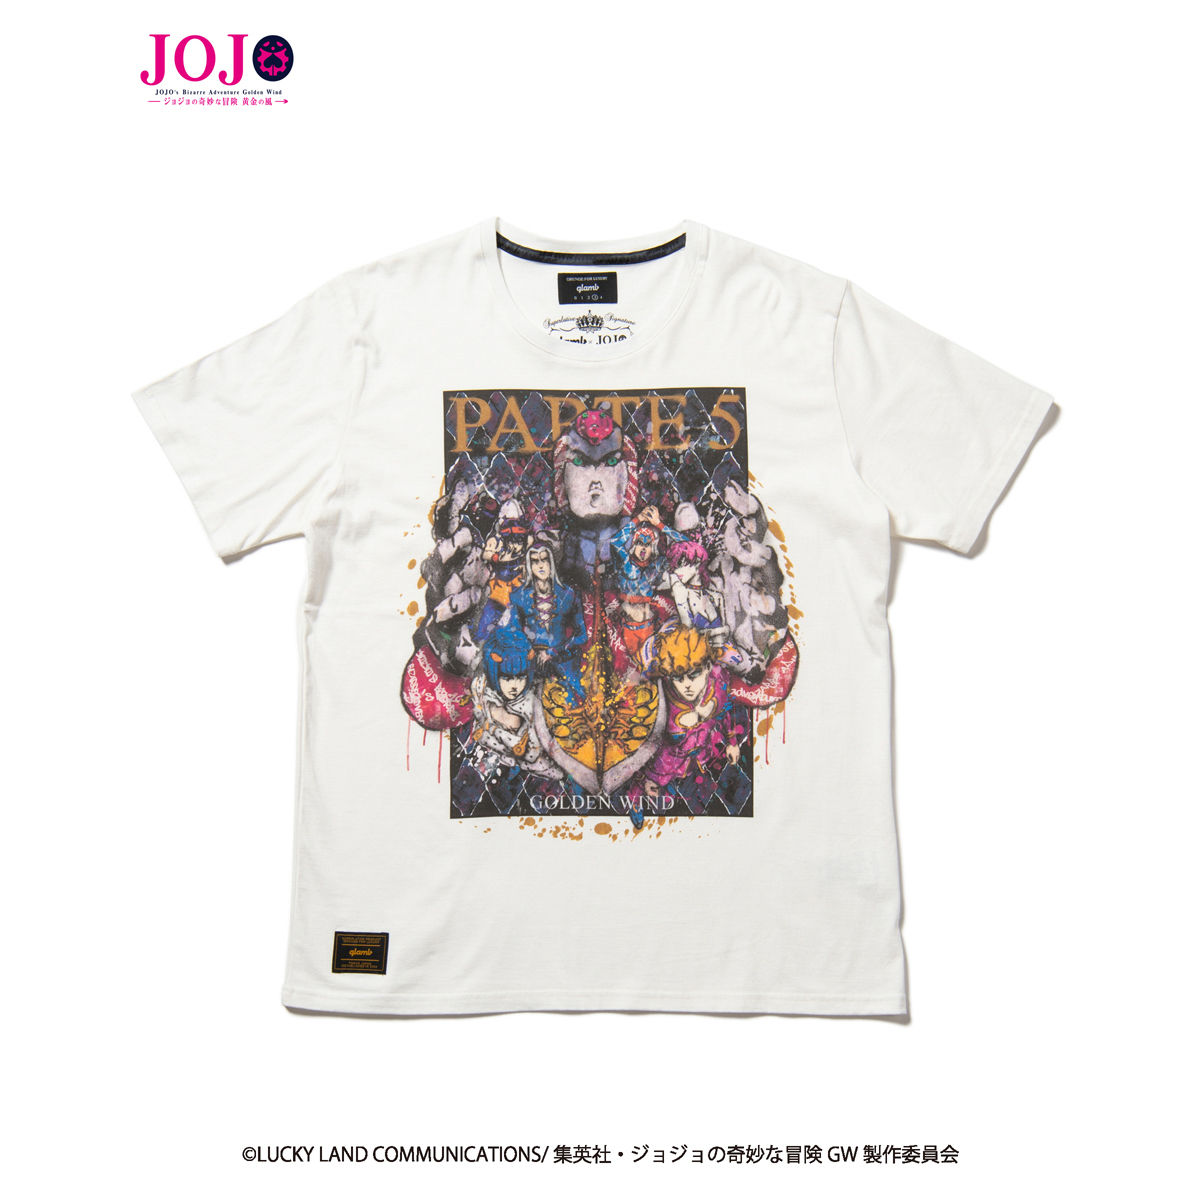 Team Bucciarati T-shirt—JoJo's Bizarre Adventure: Golden Wind/glamb Collaboration